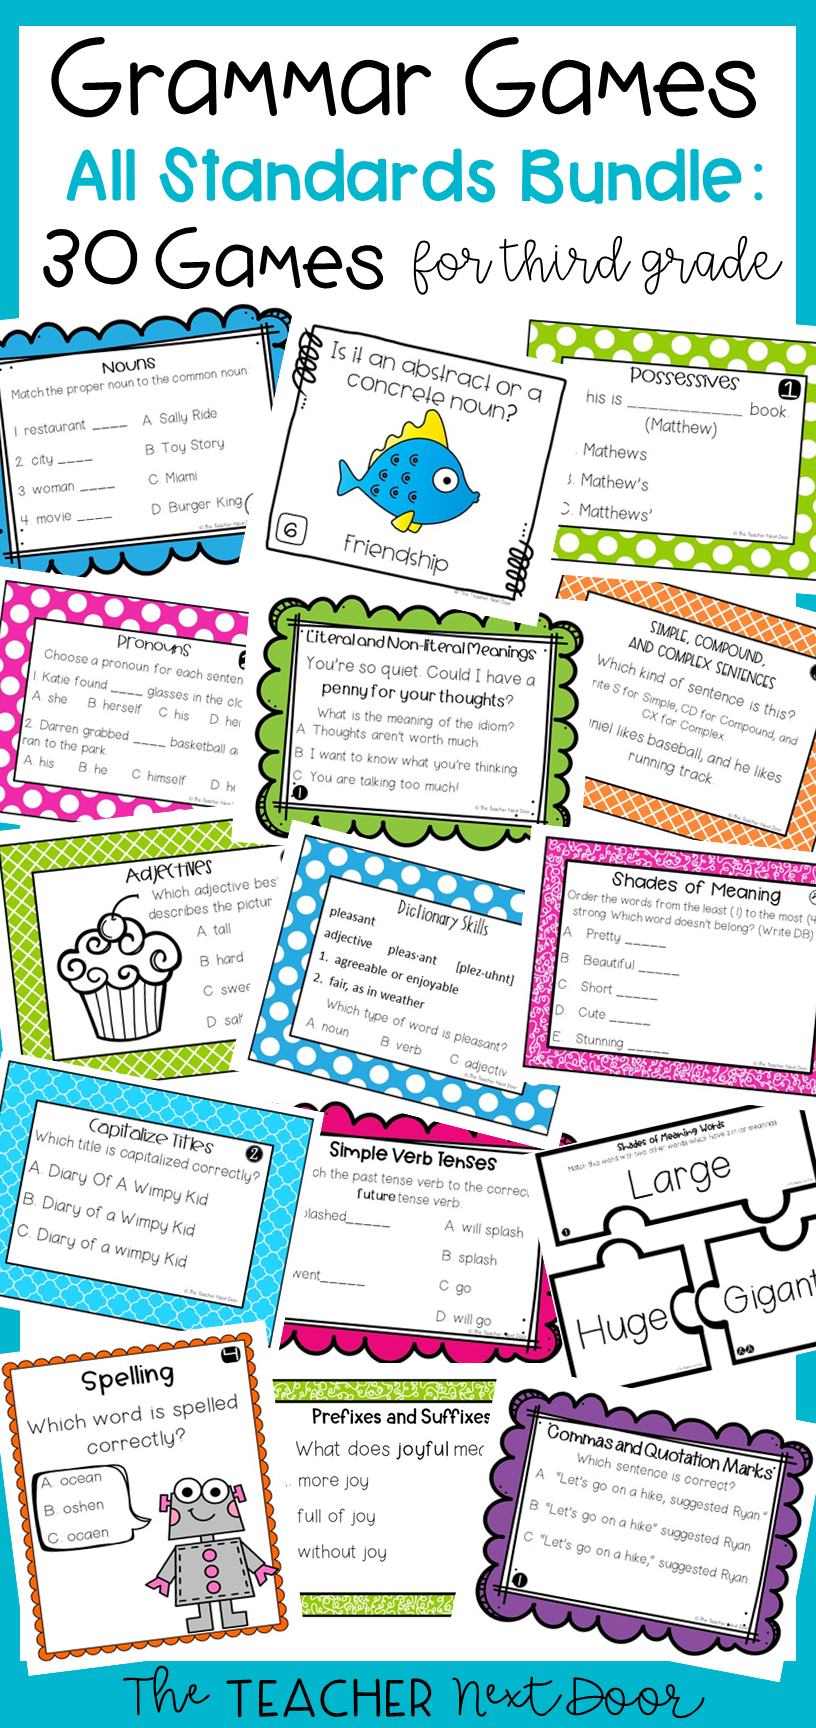 Grammar Games Bundle For 3rd Grade Grammar Games Grammar Centers Grammar [ 1728 x 816 Pixel ]